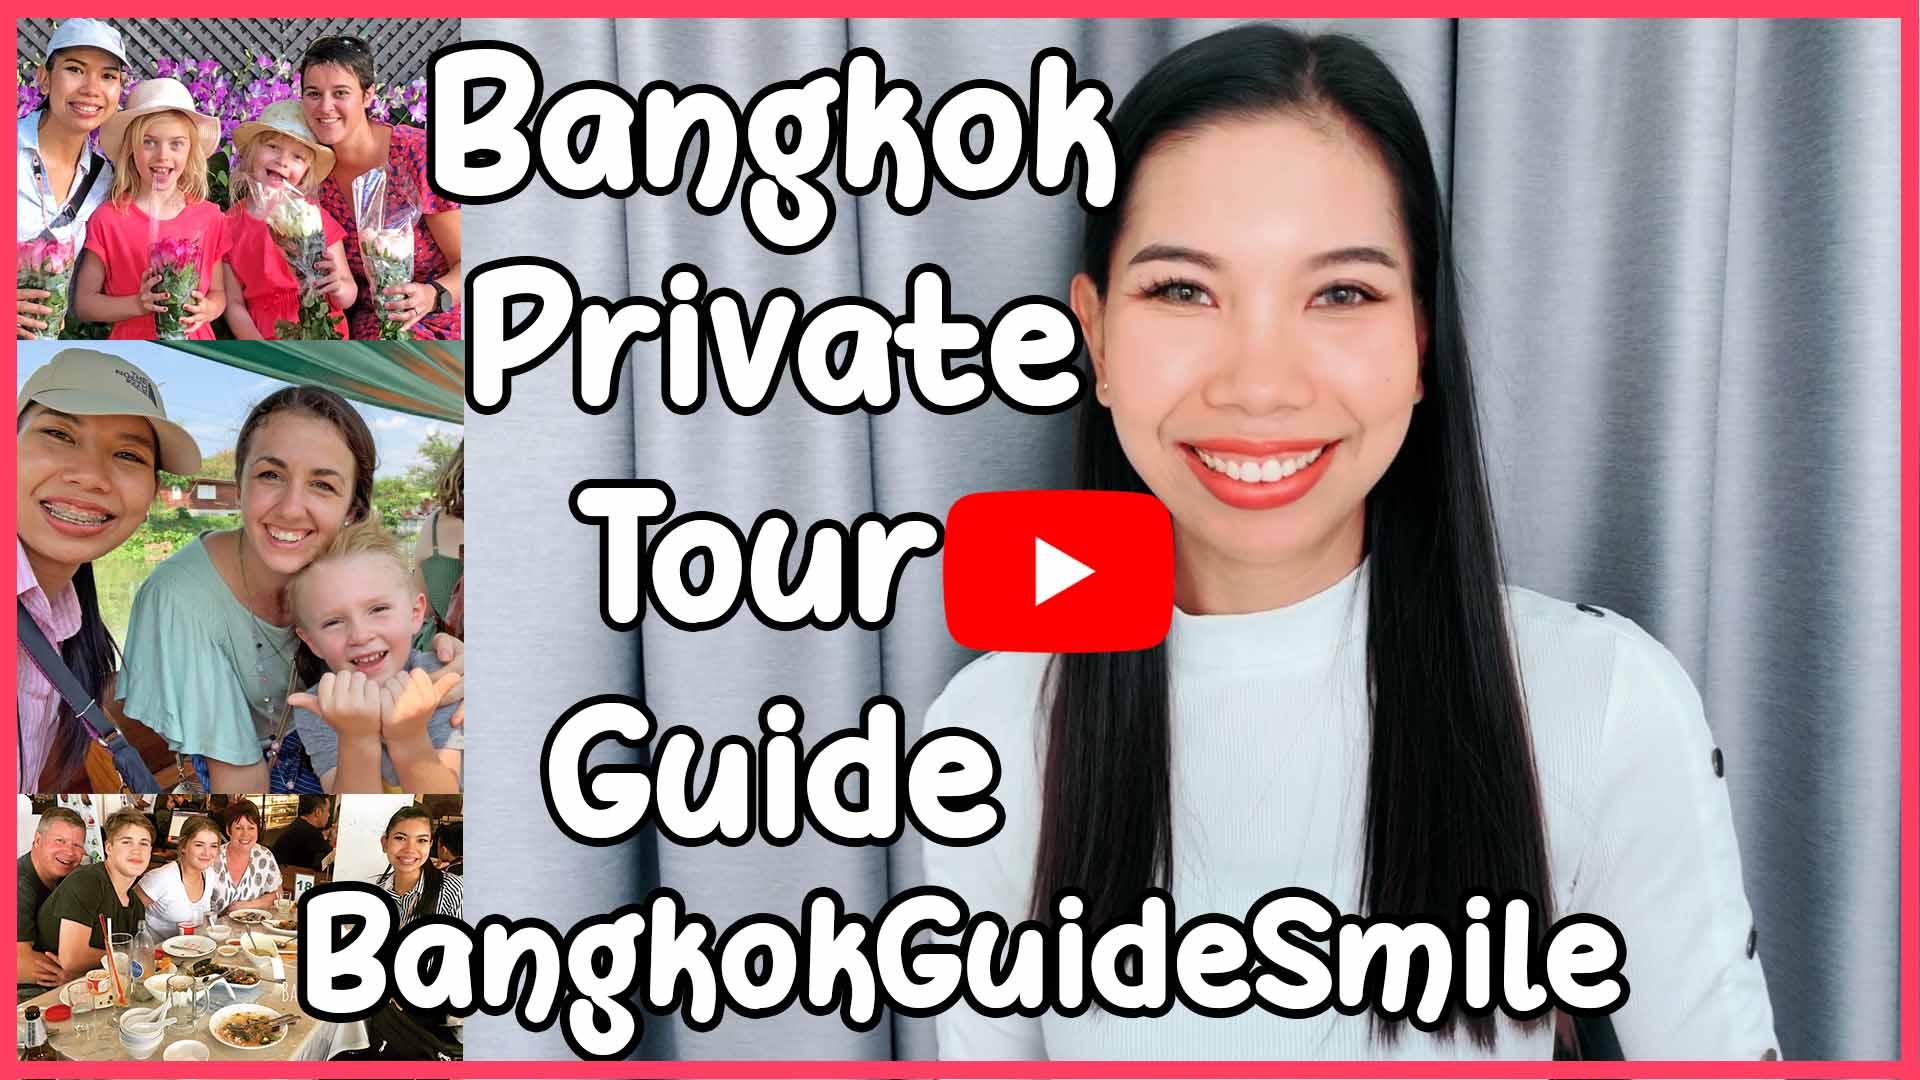 Bangkok-Guide-Smile-Private-Tour-Mandy-Thumbnail-Youtube-02.jpg